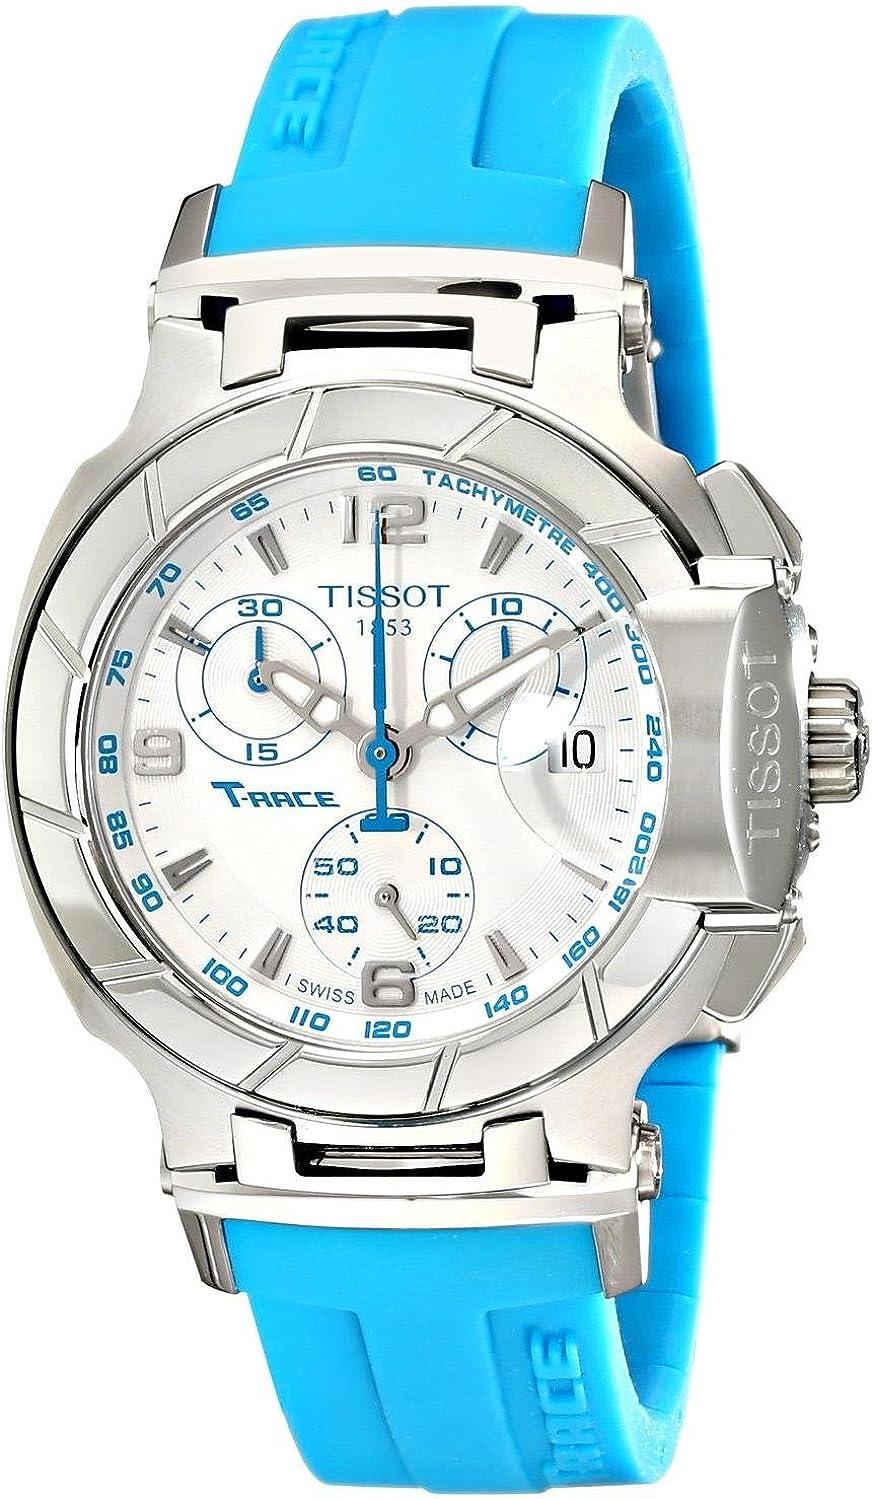 Mujer Reloj Tissot t0482171701702T-Race T-Race analógico cronógrafo Blanco y BLU